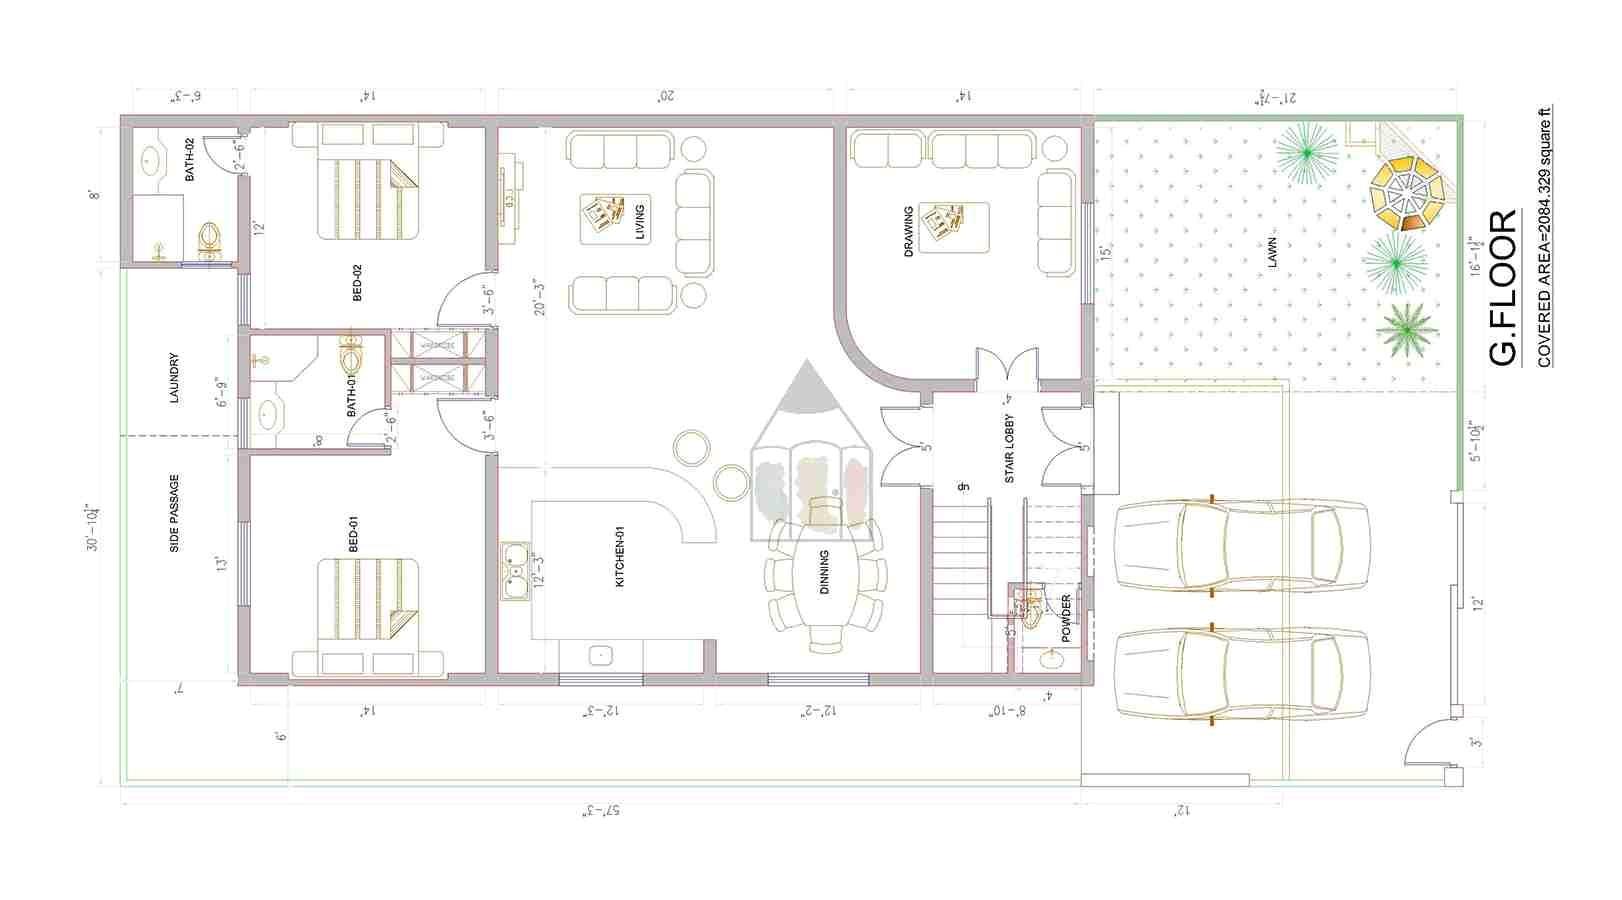 14 marla house plan layout